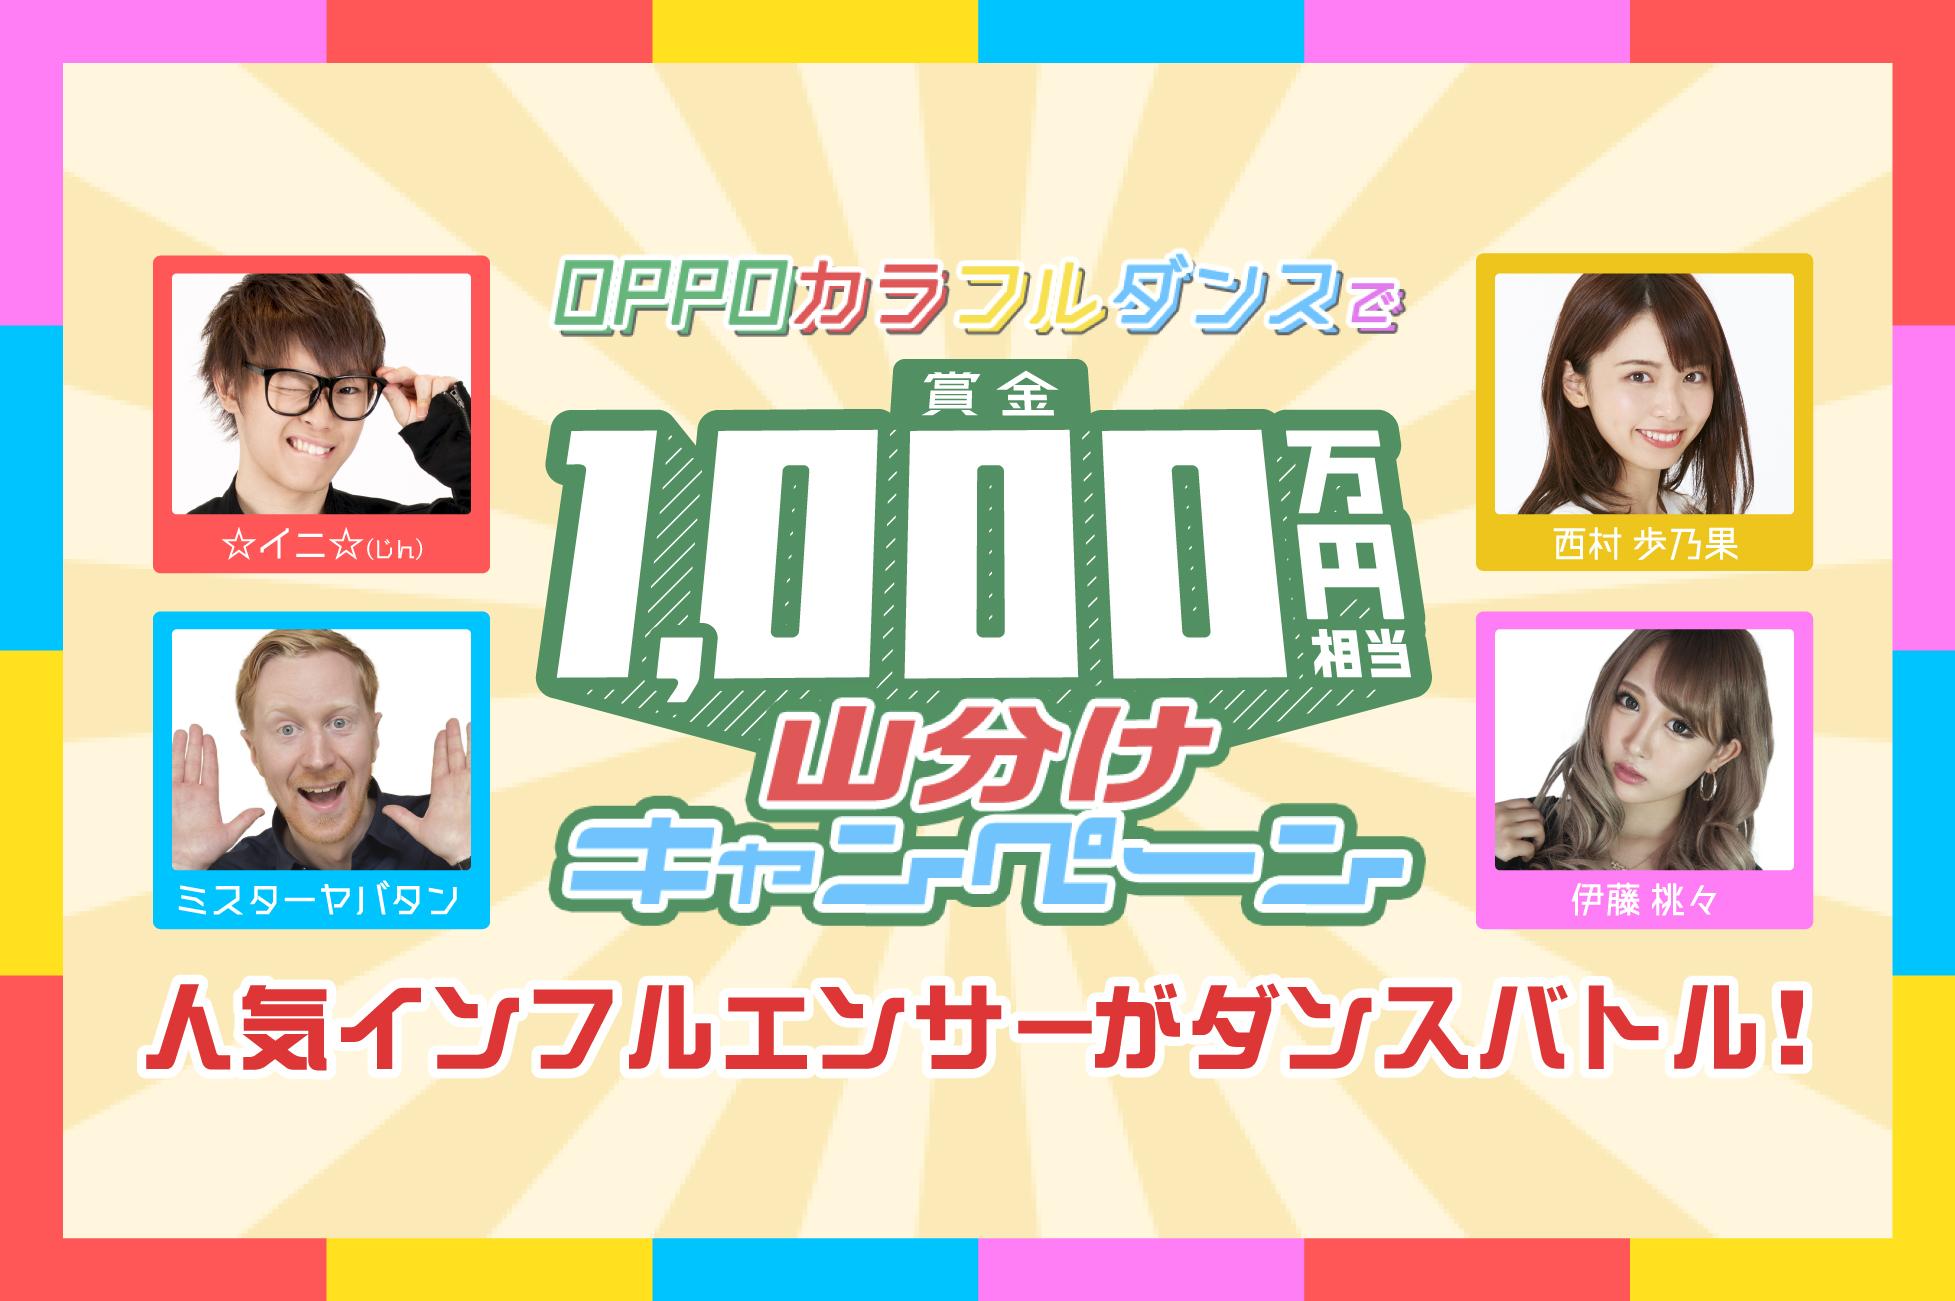 OPPOカラフルダンスで賞金1000万円相当山分けキャンペーン開催